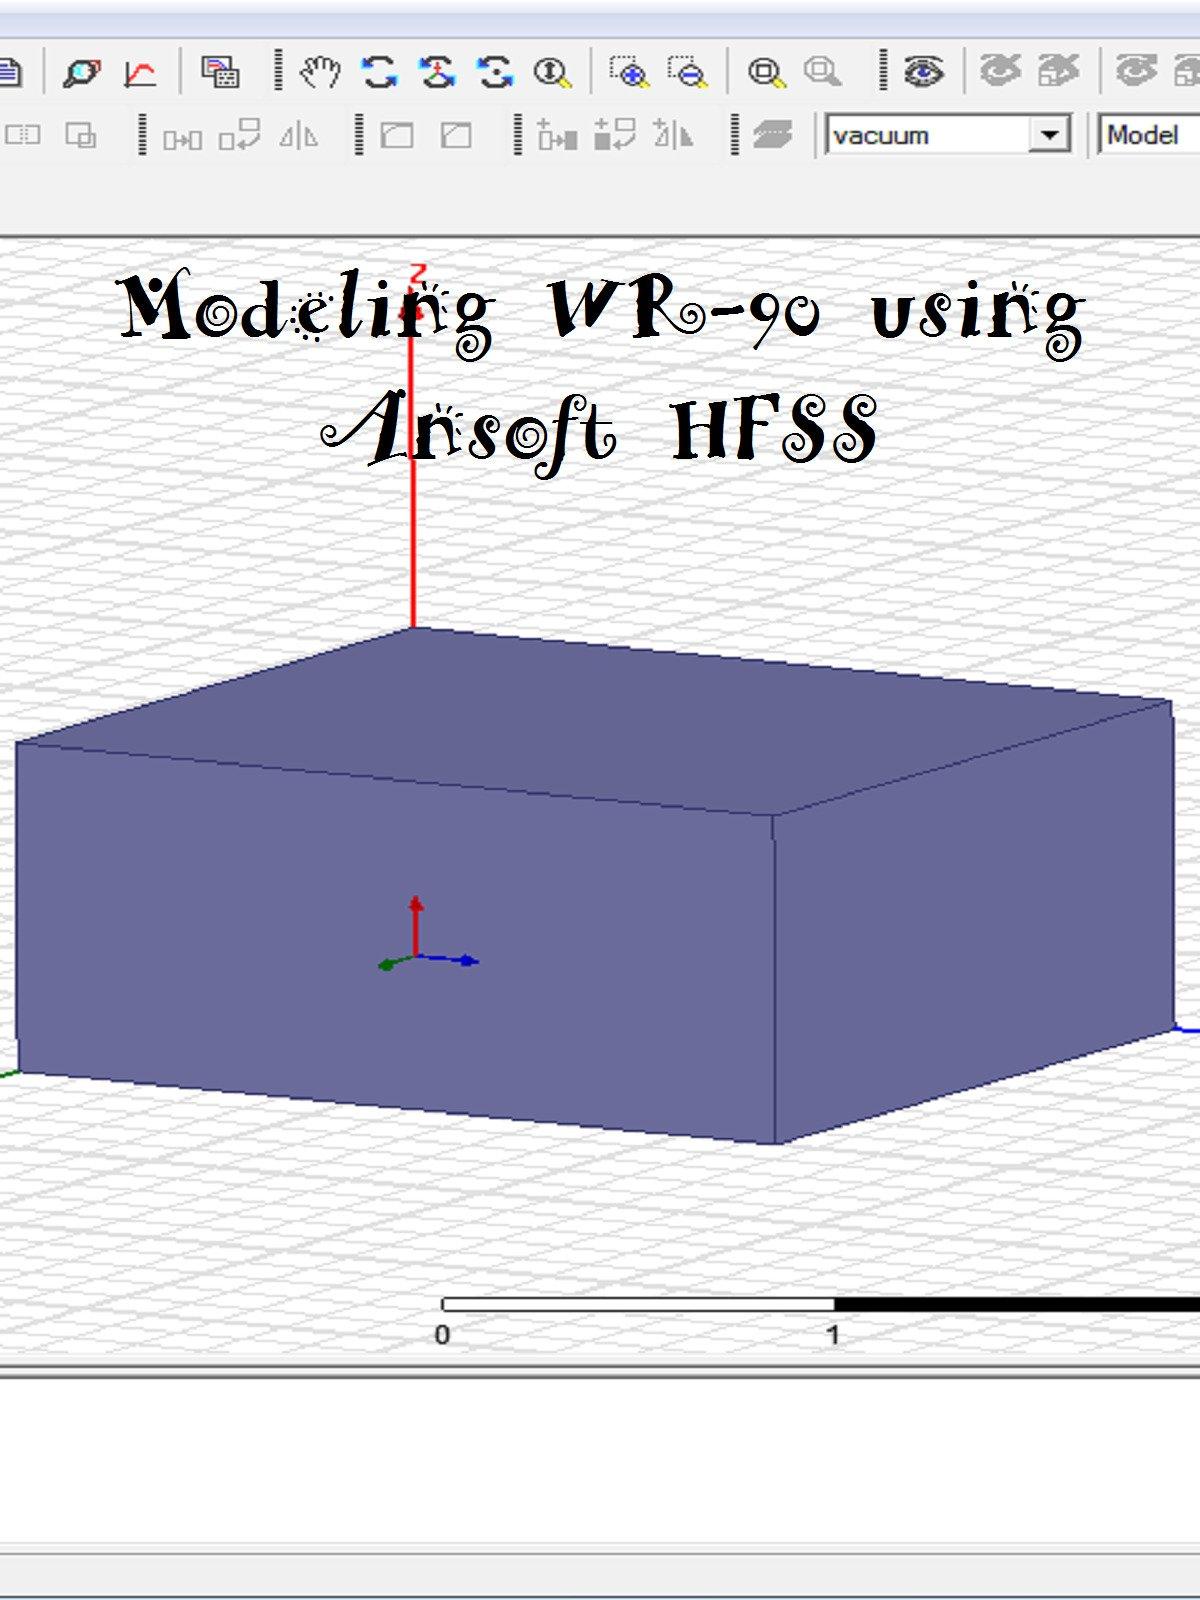 Amazon com: Watch Modeling WR-90 using Ansoft HFSS | Prime Video